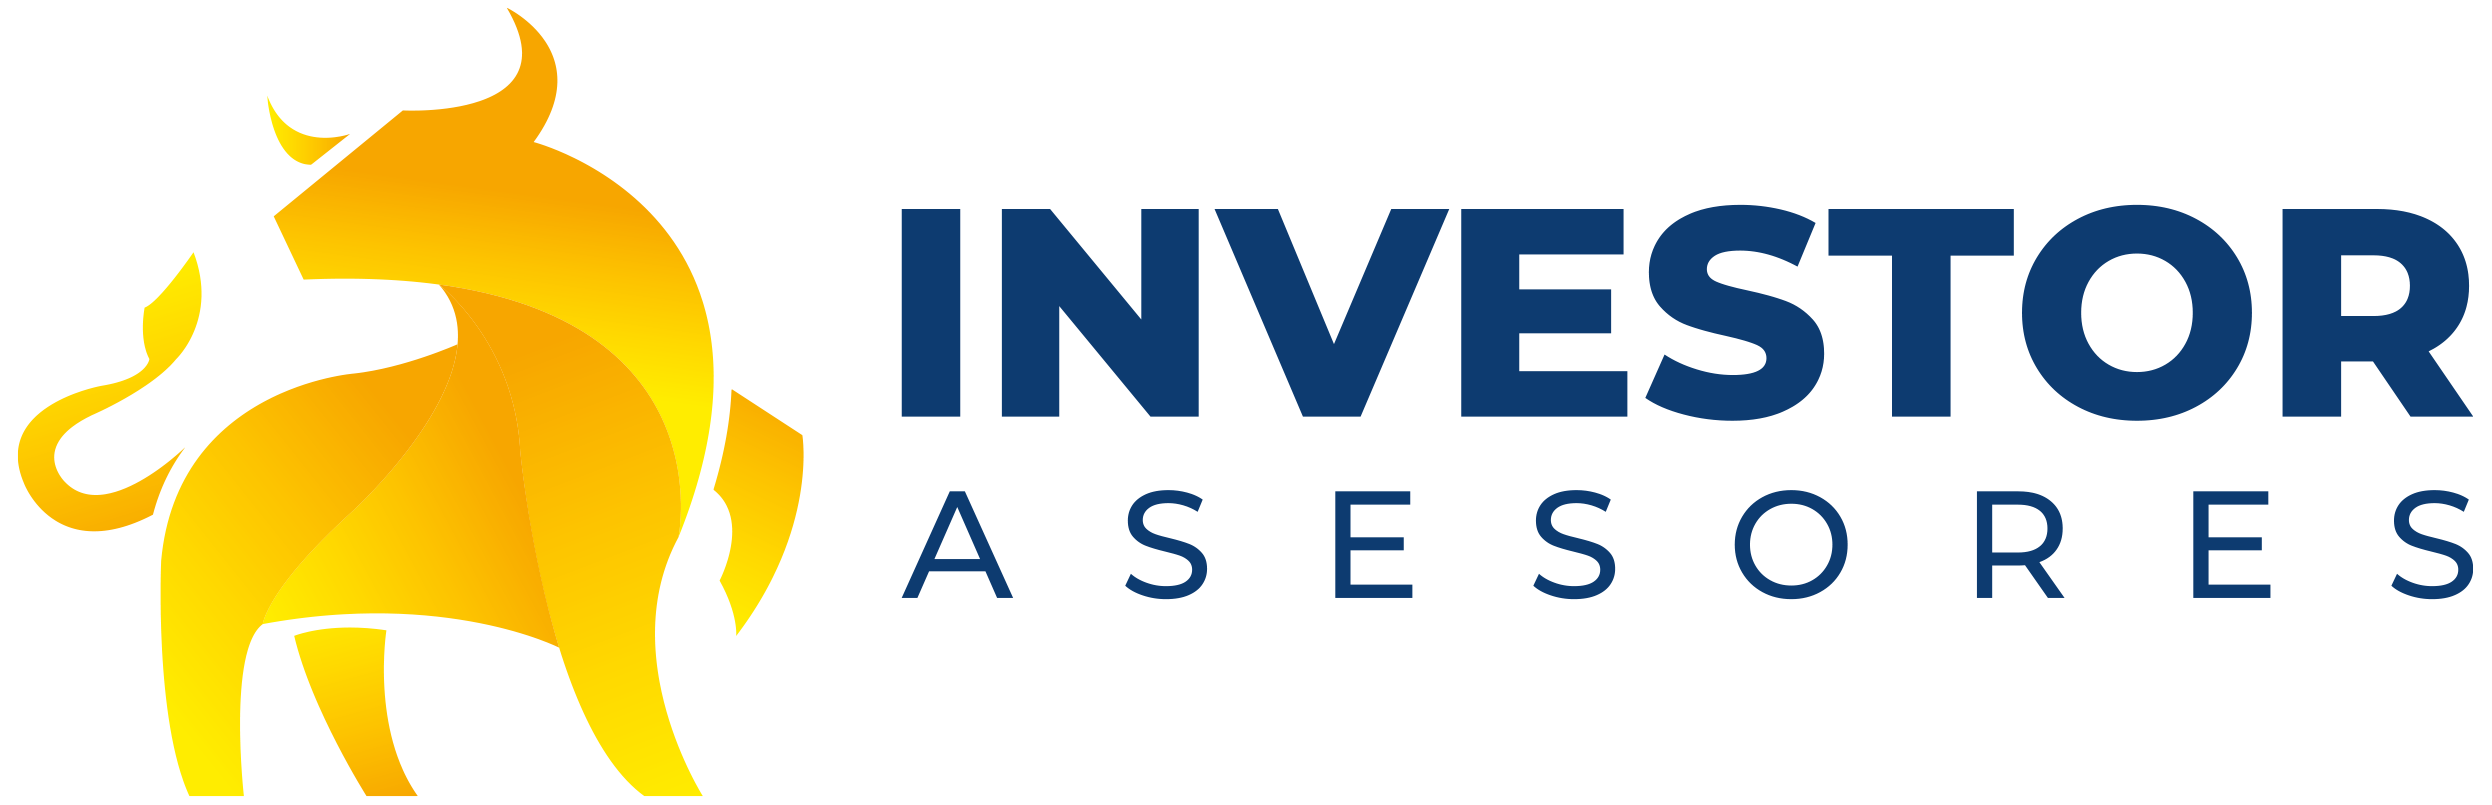 Investor Asesores